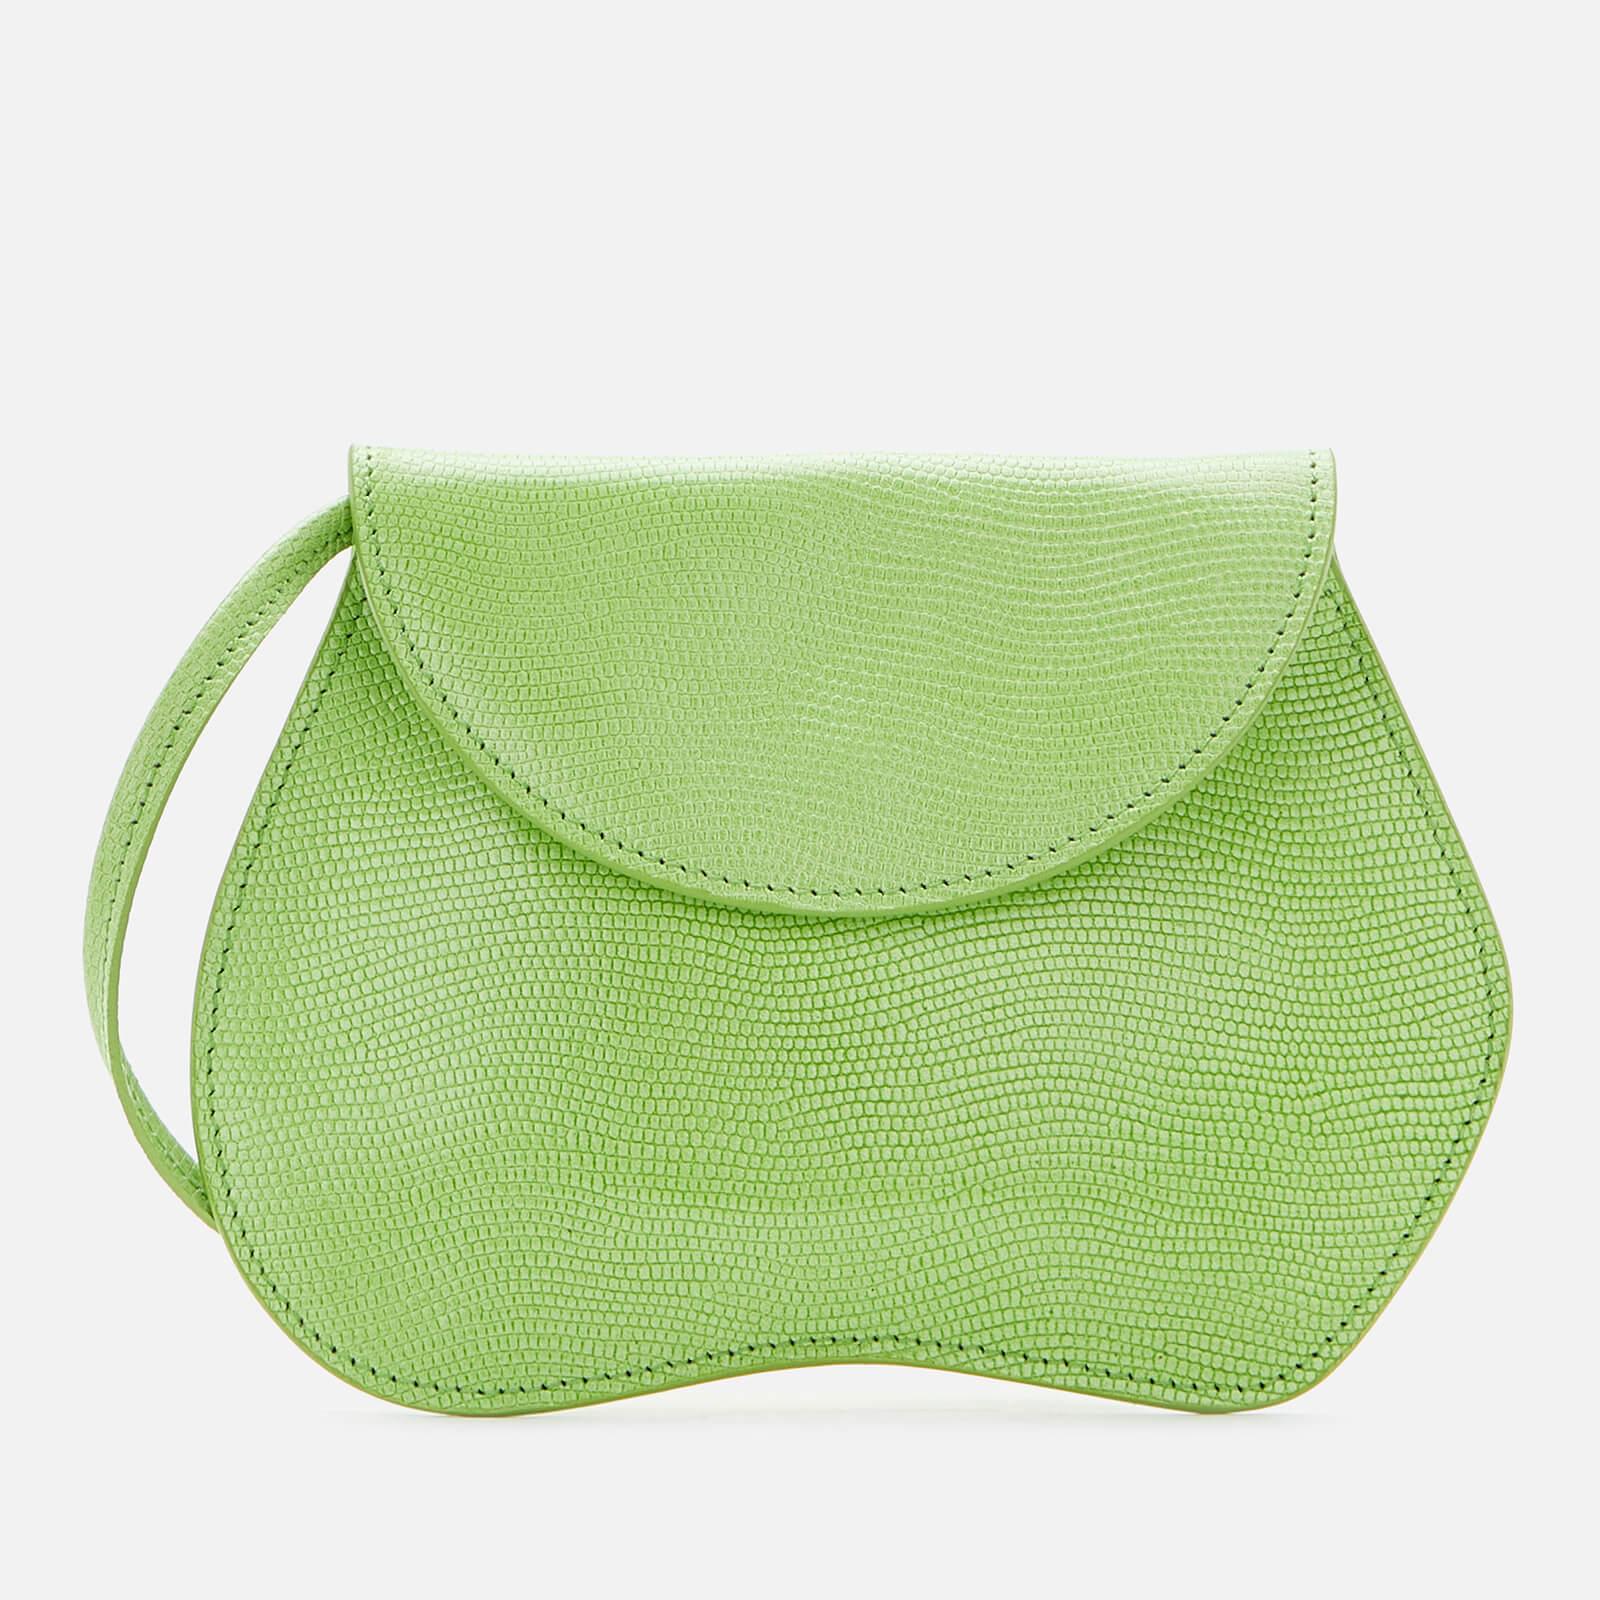 Little Liffner Women's Pebble Lizard Micro Bag - Acid Green